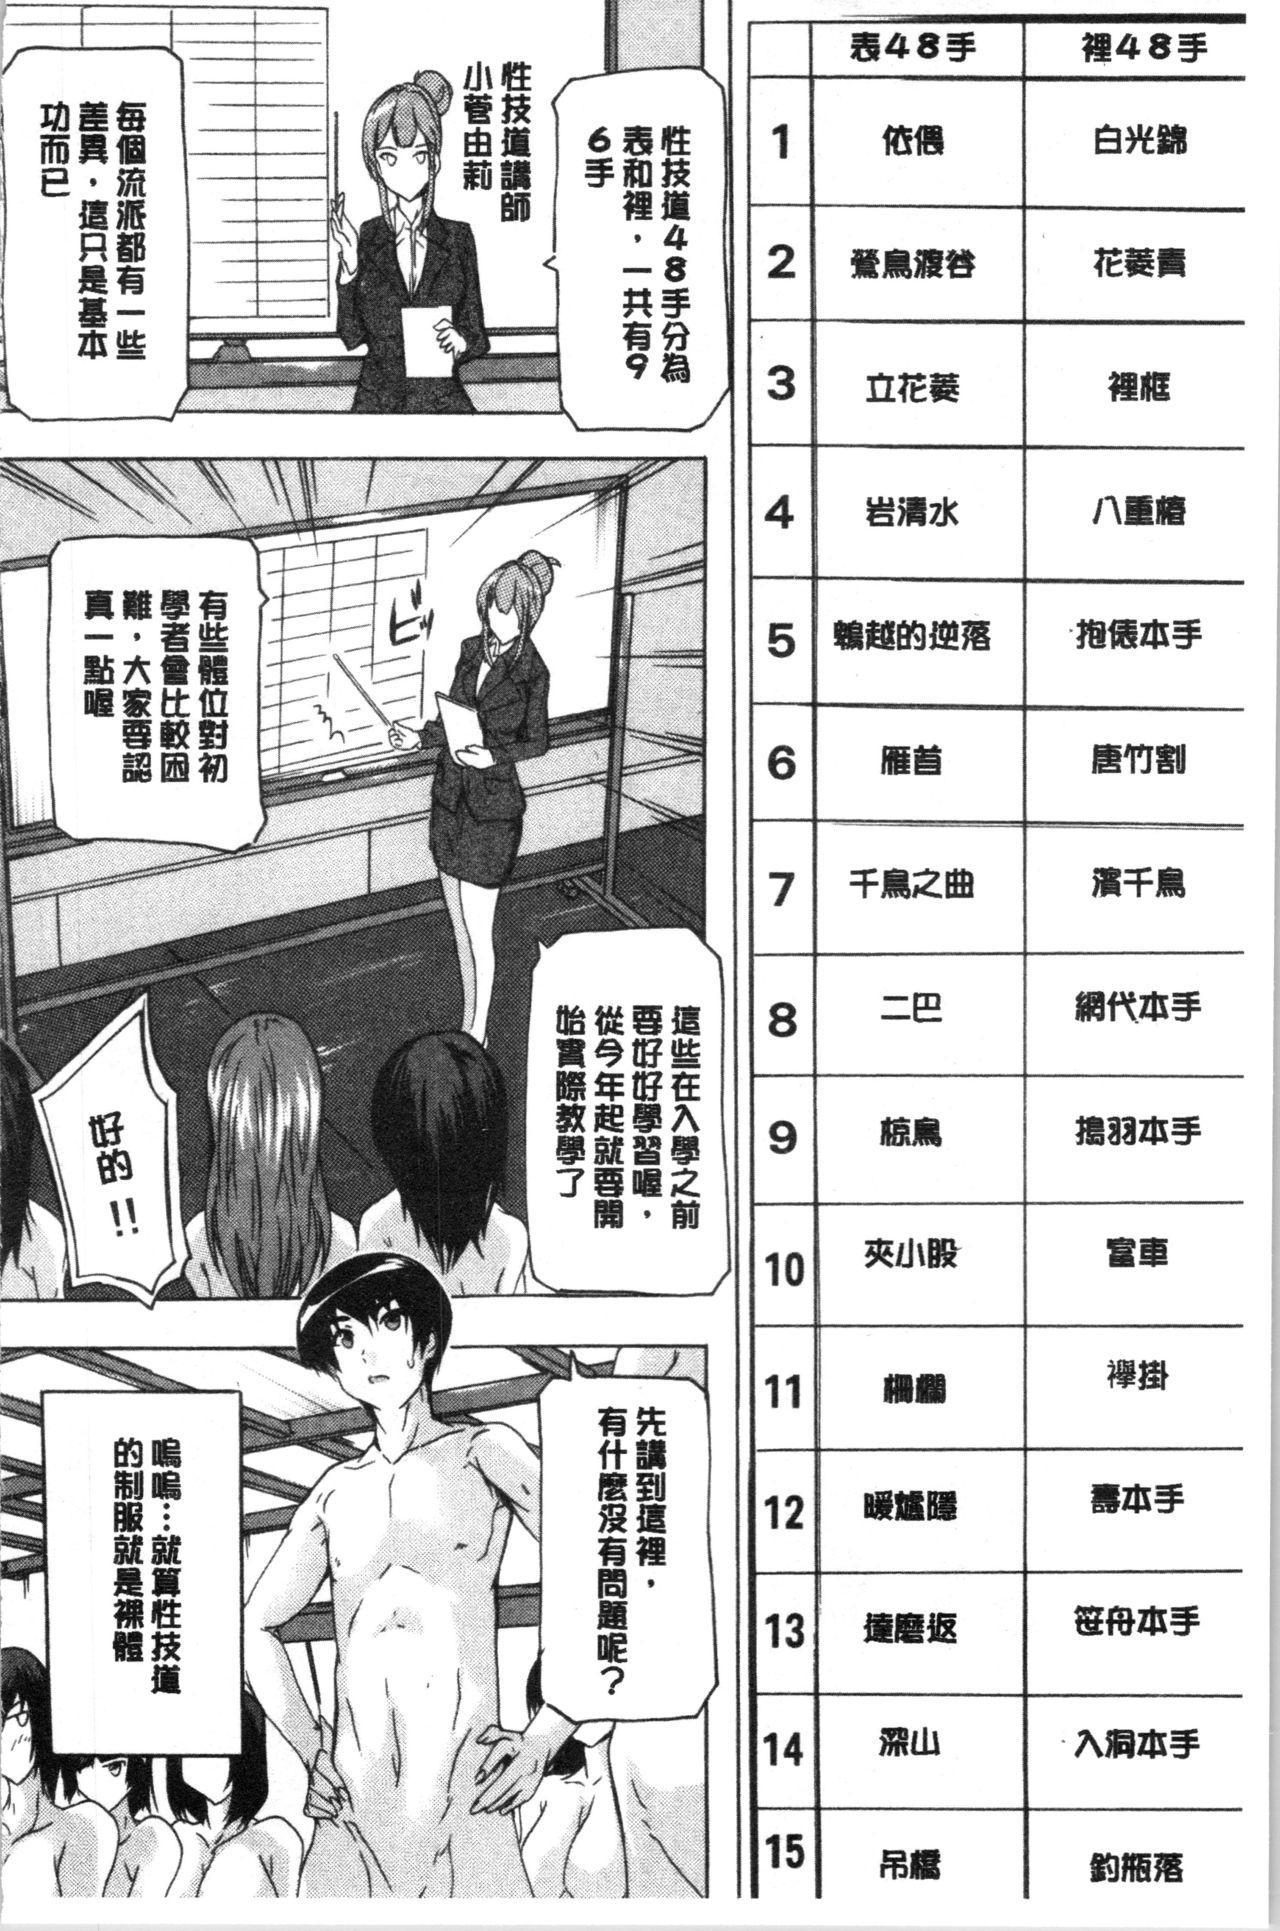 [Natsuka Q-Ya] Hisshuu!! Sex-bu - SEIGI-DO The Ultimate Martial Arts   必修!!性愛淫交部 [Chinese] 38